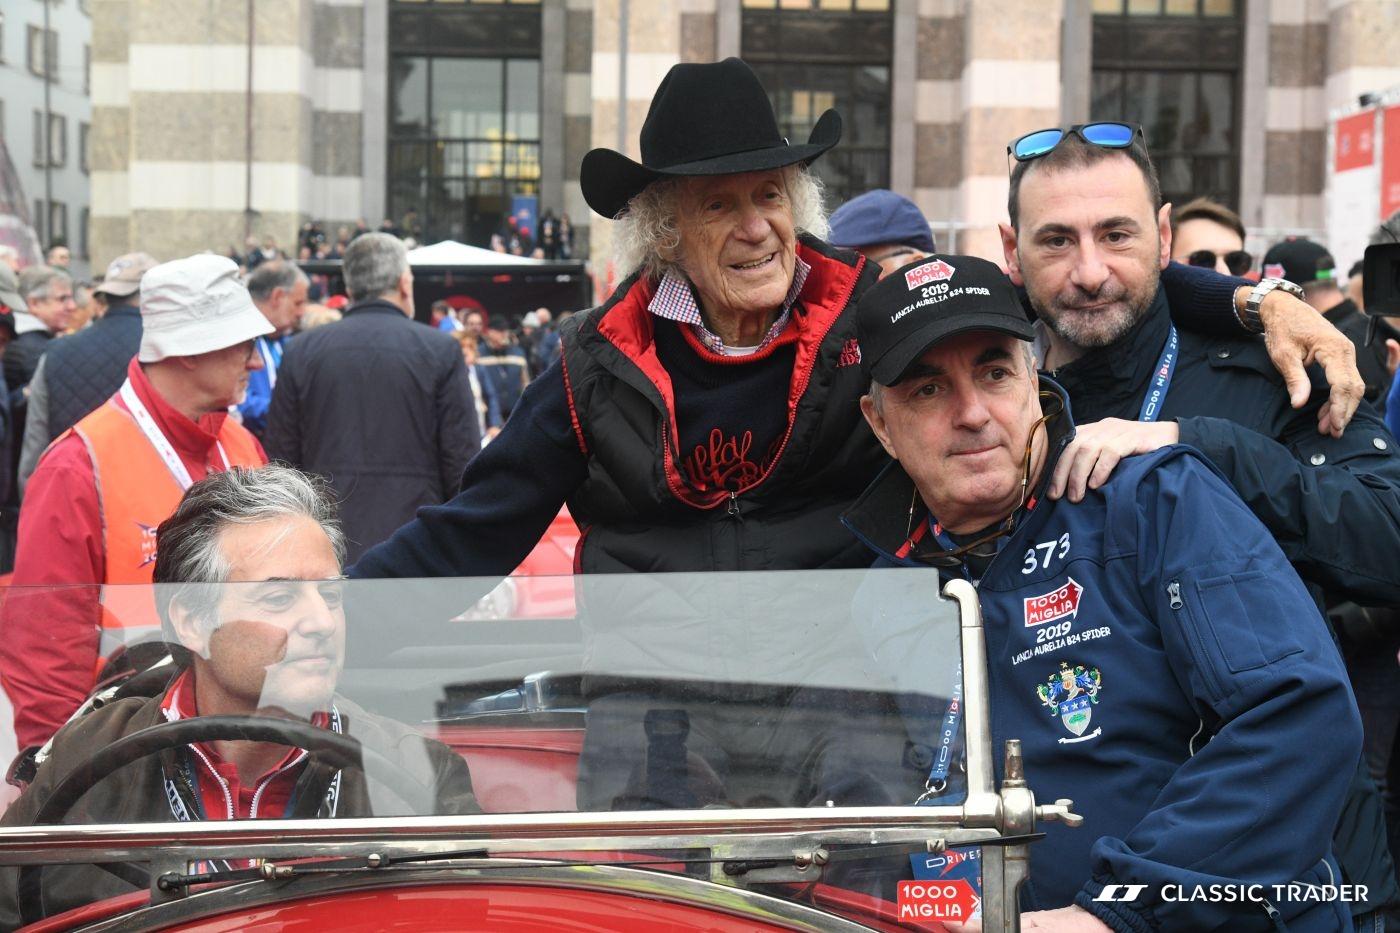 Mille Miglia 2019 Stefano Valente Arturo Merzario (4)